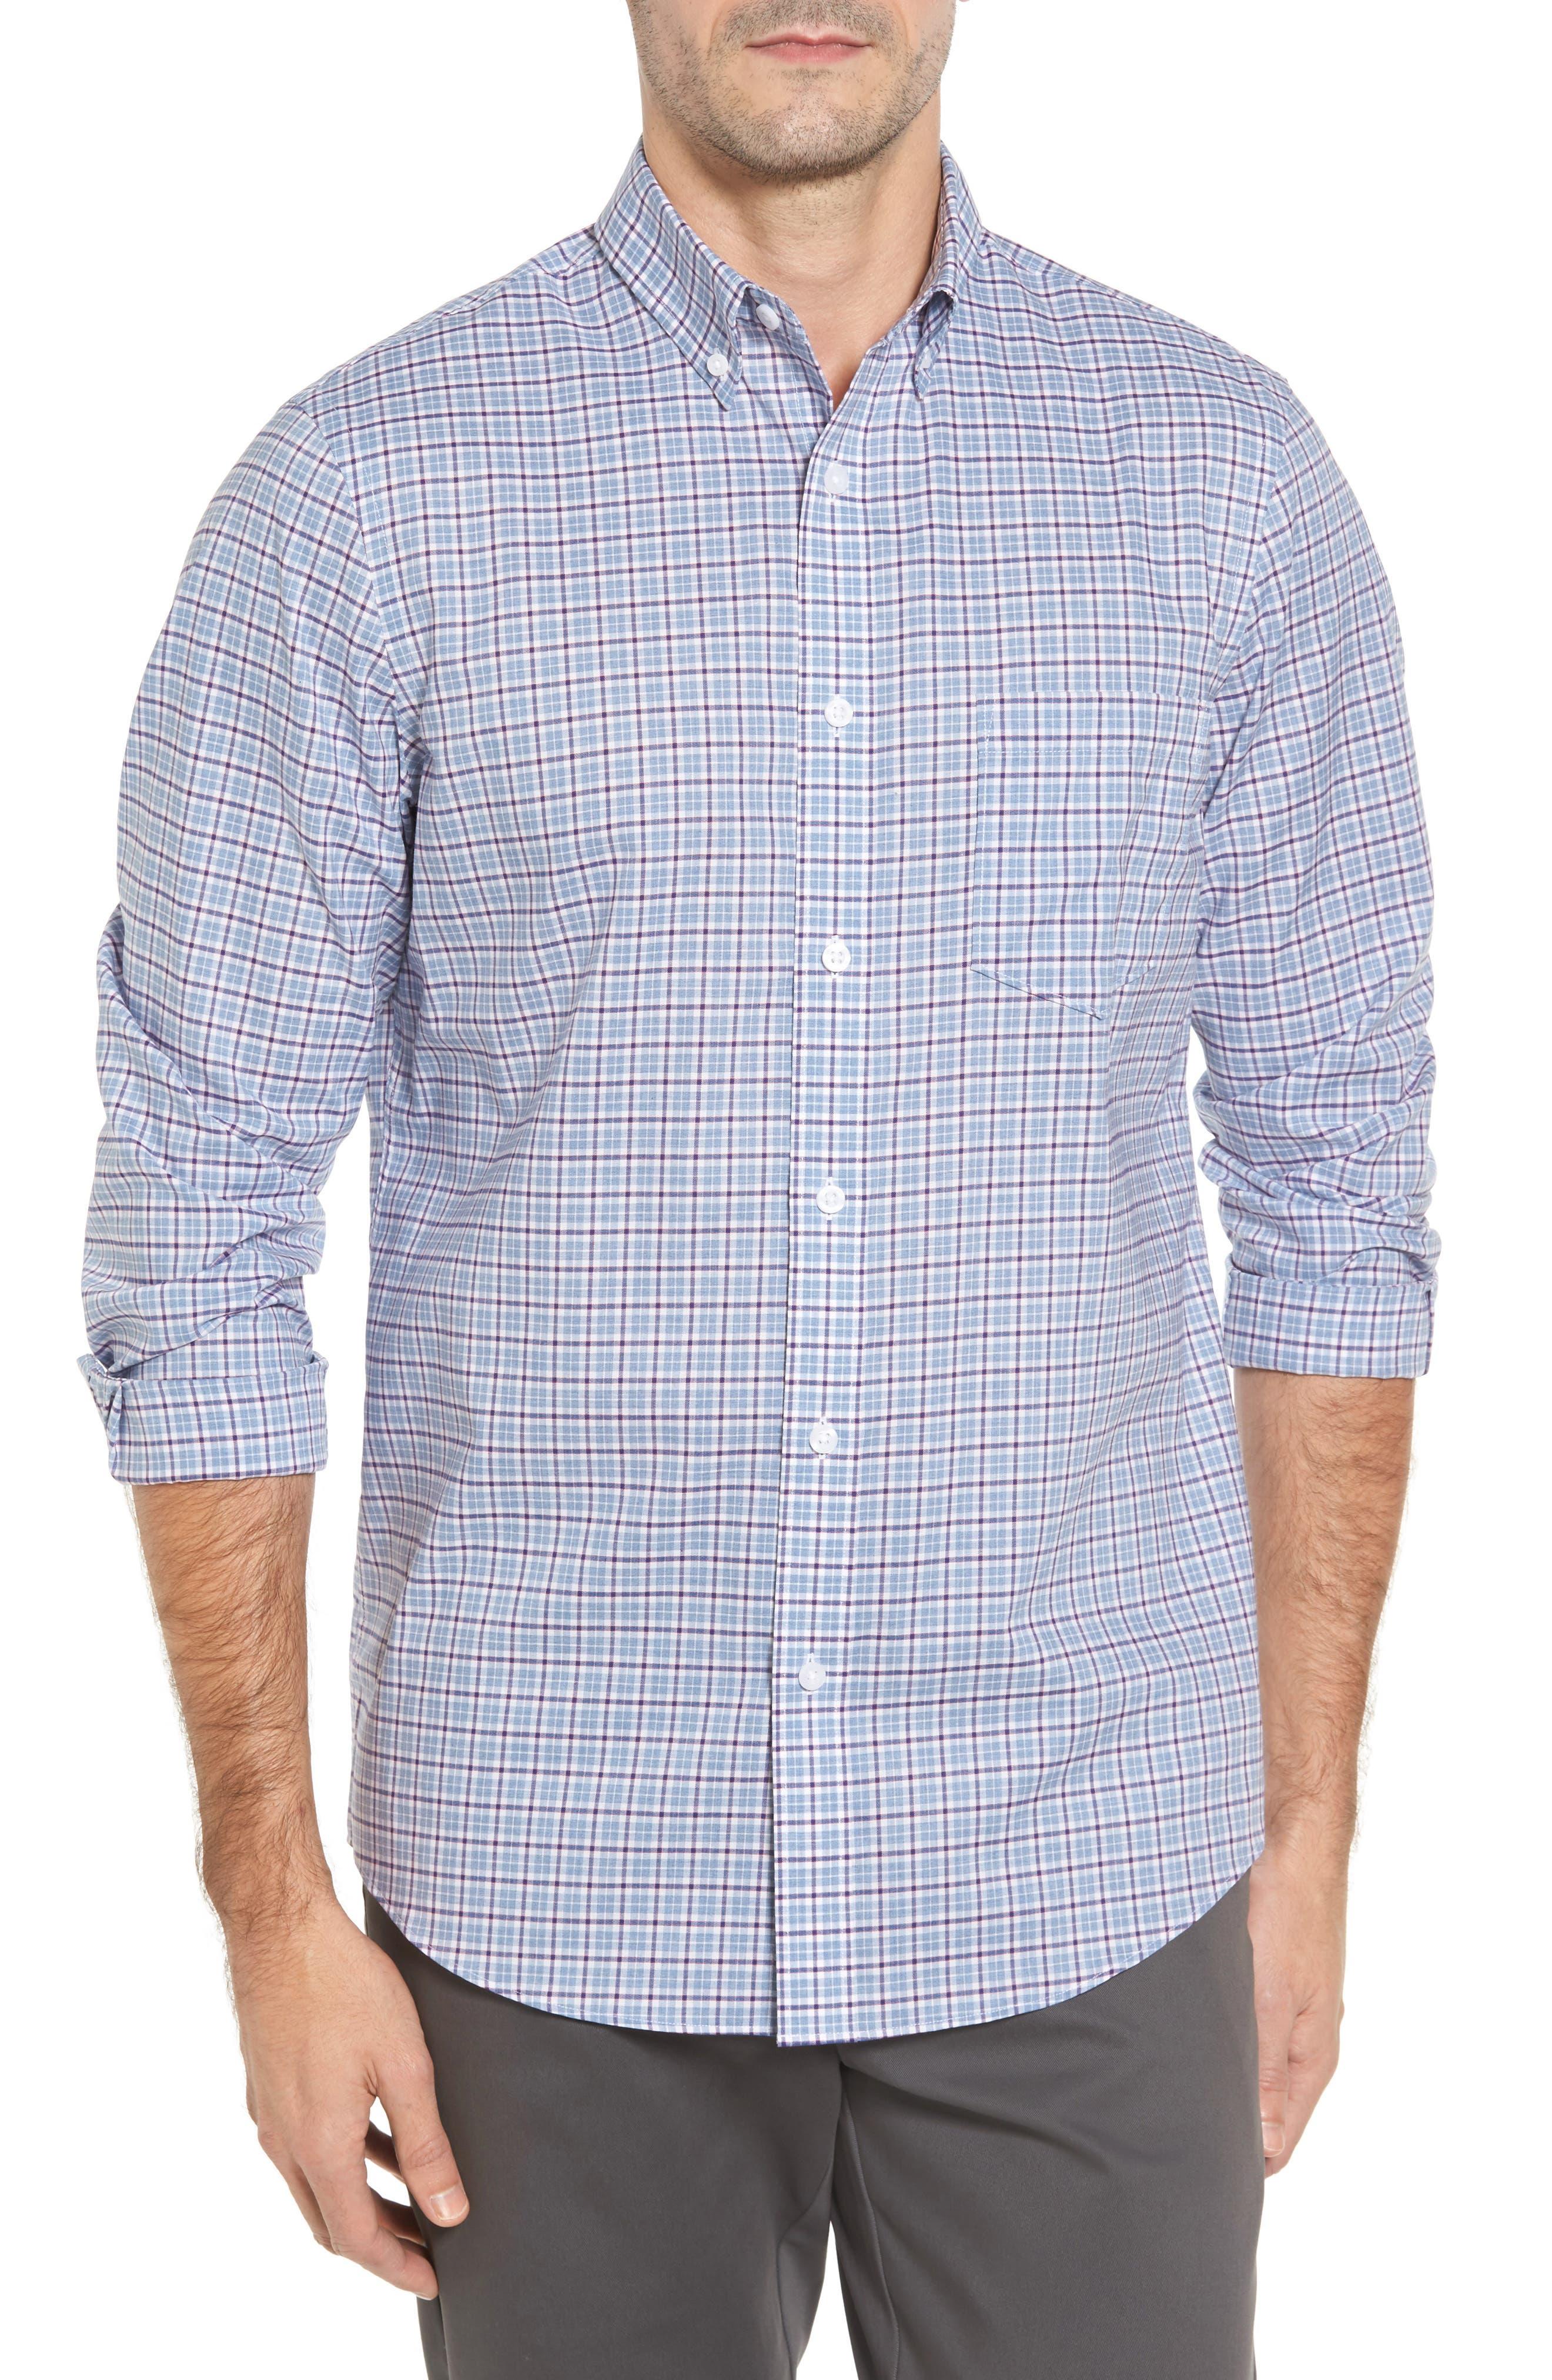 Main Image - Nordstrom Men's Shop Non-Iron Regular Fit Check Sport Shirt